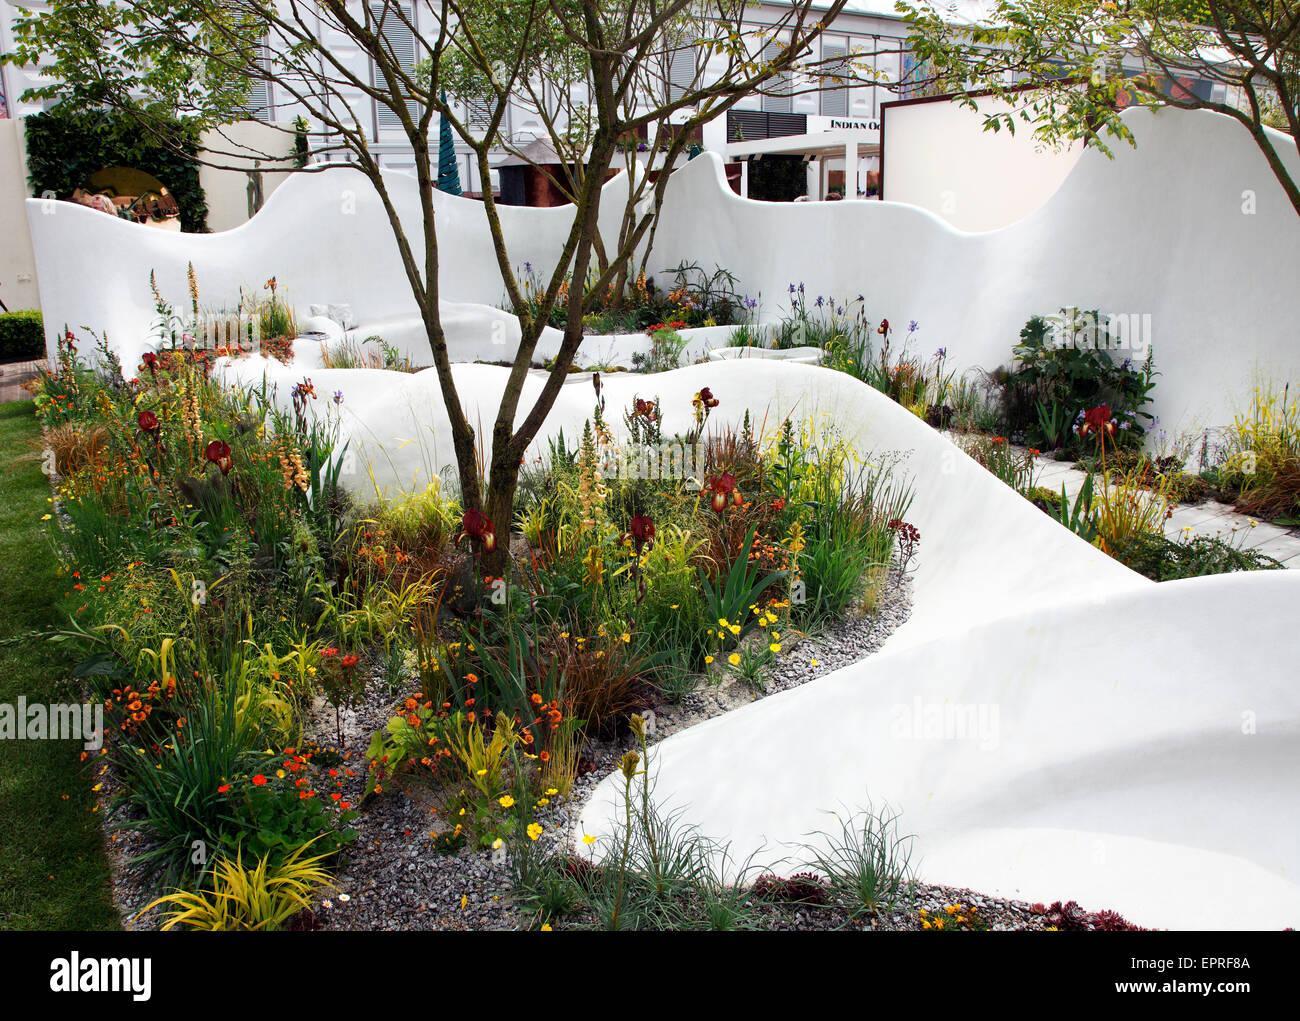 Good Pure Land Foundation Garden, Fresh Garden At RHS Chelsea Flower Show 2015    Stock Image